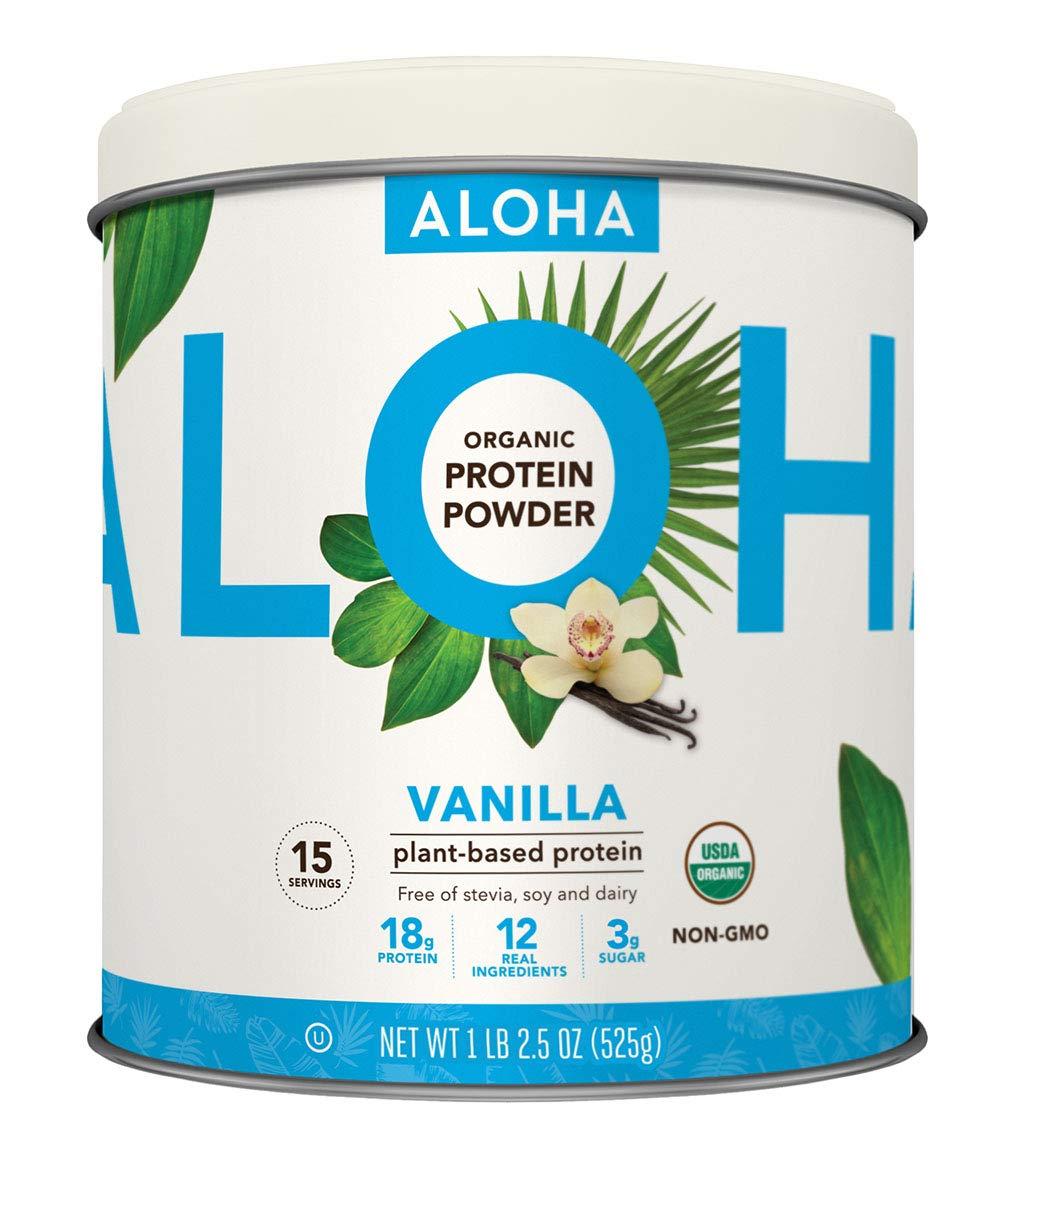 ALOHA Organic Vanilla Plant Based Protein Powder, 18.5 oz, 15 Servings, Vegan, Gluten Free, Non-GMO, Stevia Free, Soy Free, Dairy Free by ALOHA